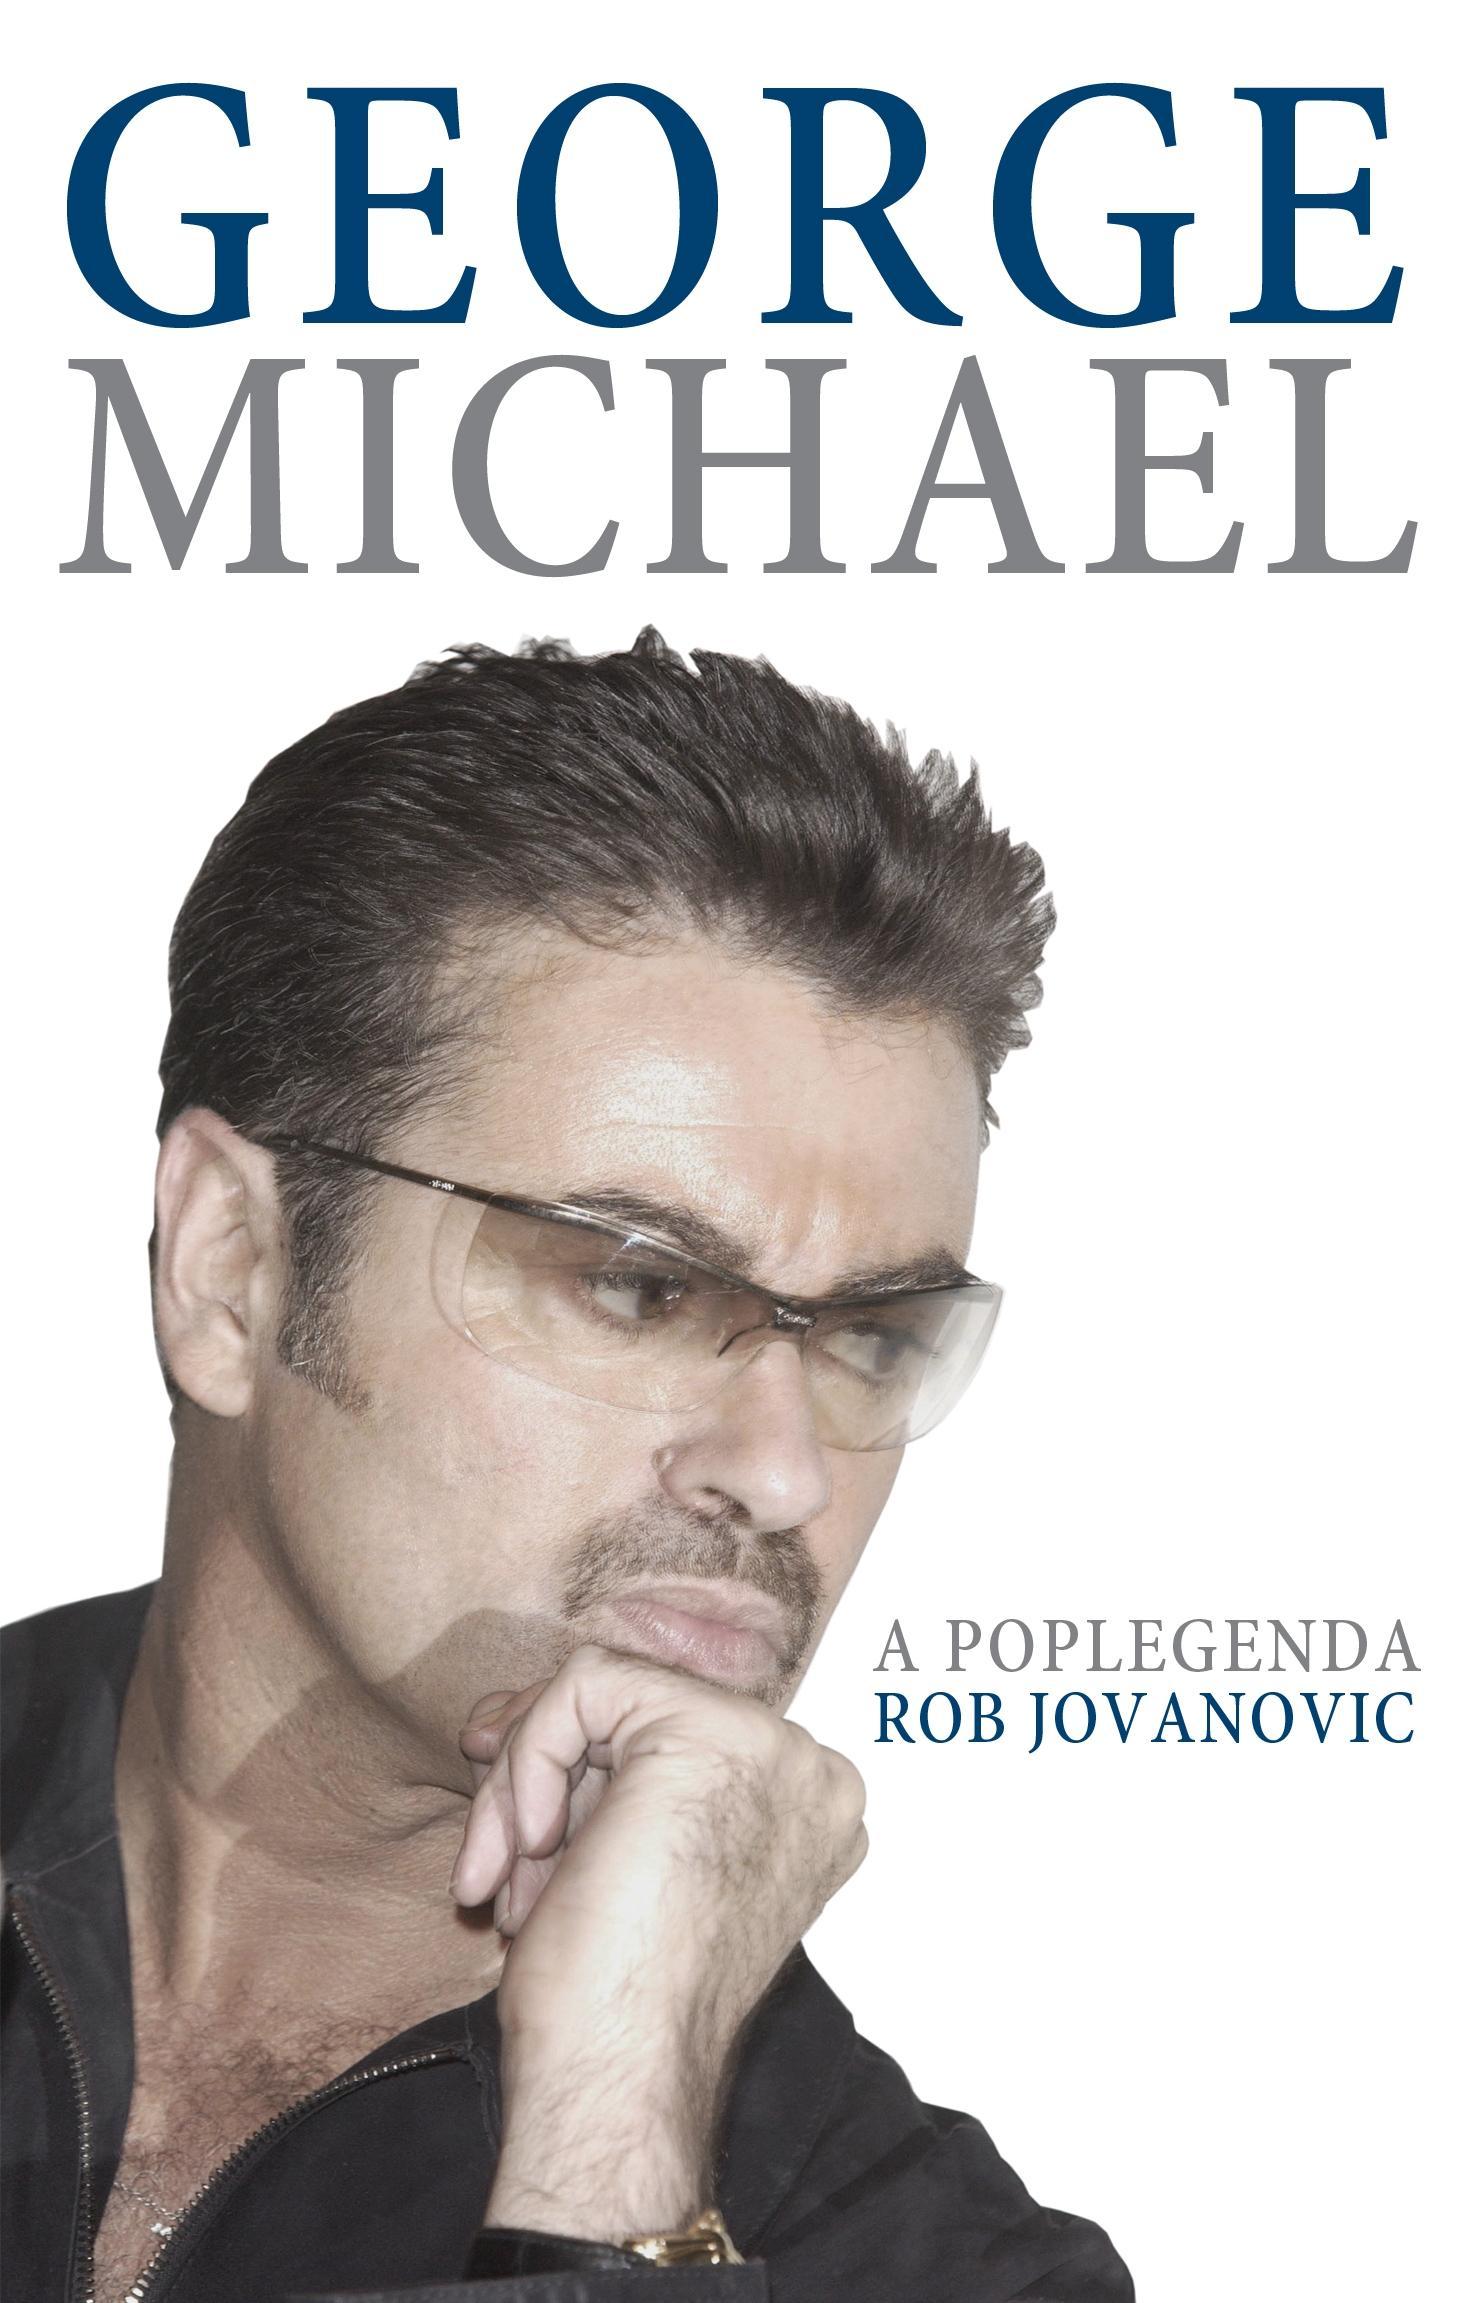 GEORGE MICHAEL - A POPLEGENDA